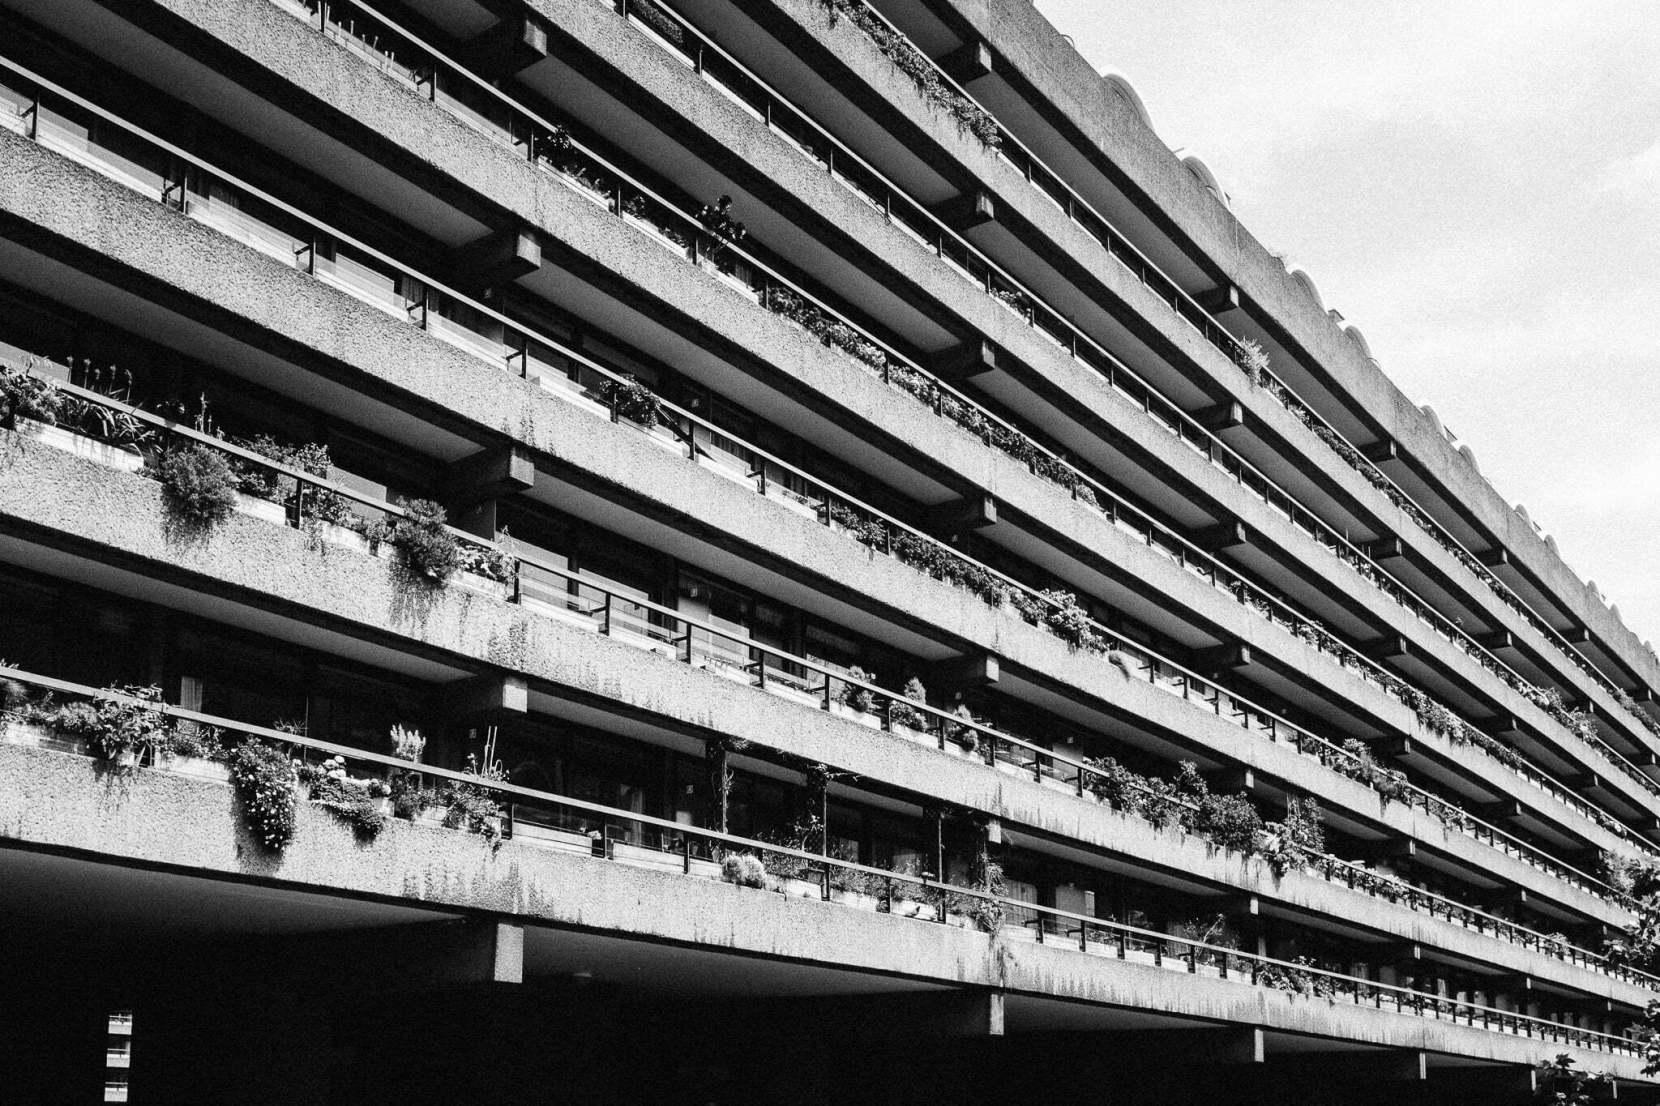 london-barbican-2093-pete-carr